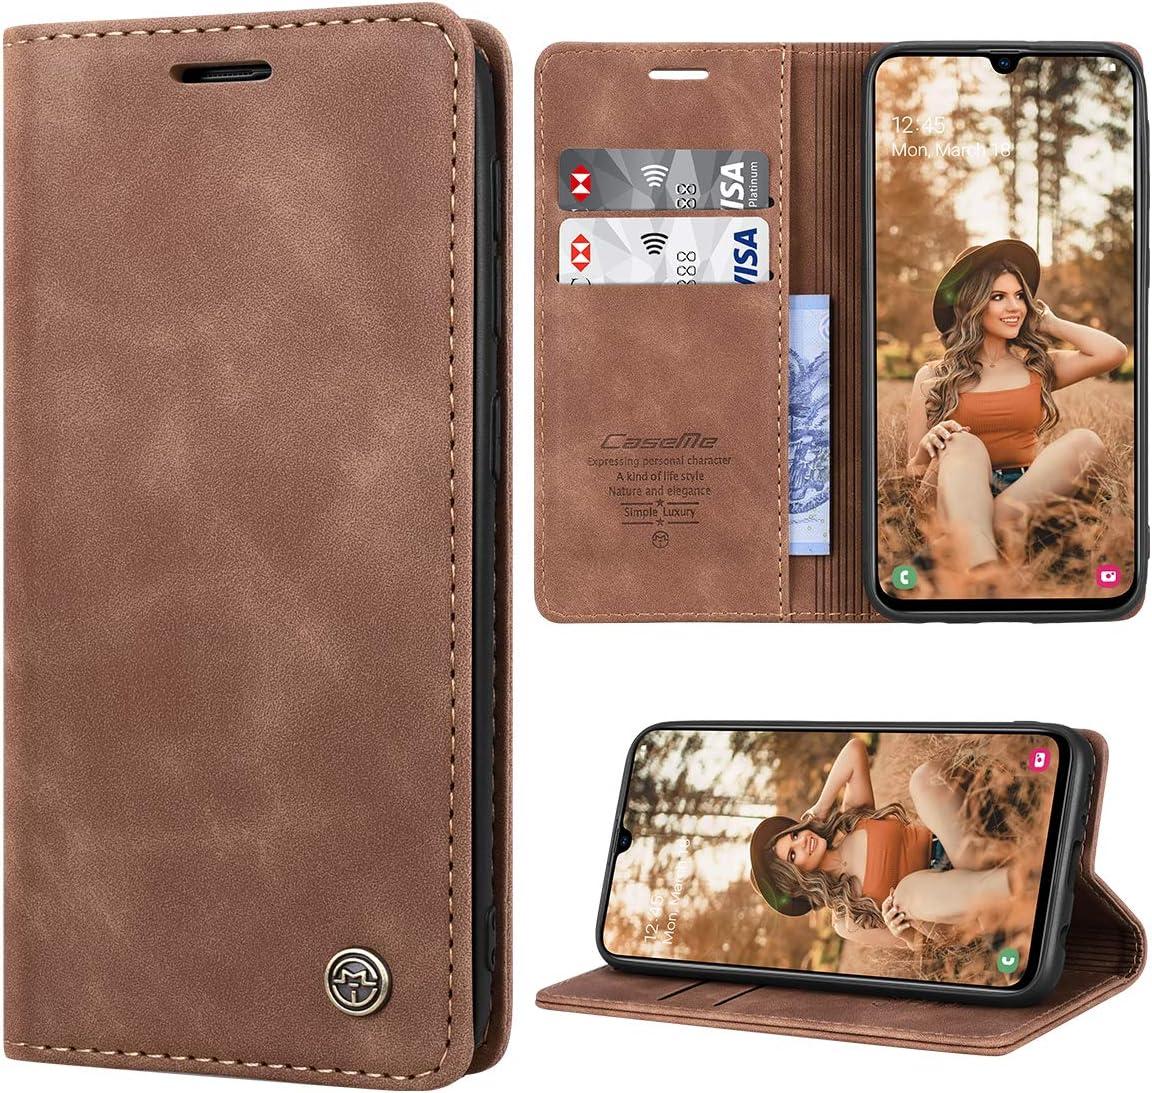 RuiPower Handyh/ülle f/ür Samsung Galaxy A51 H/ülle Premium Leder PU Flip Case Wallet Lederh/ülle Klapph/ülle Magnetisch Silikon Bumper Schutzh/ülle f/ür Samsung Galaxy A51 Tasche Schwarz